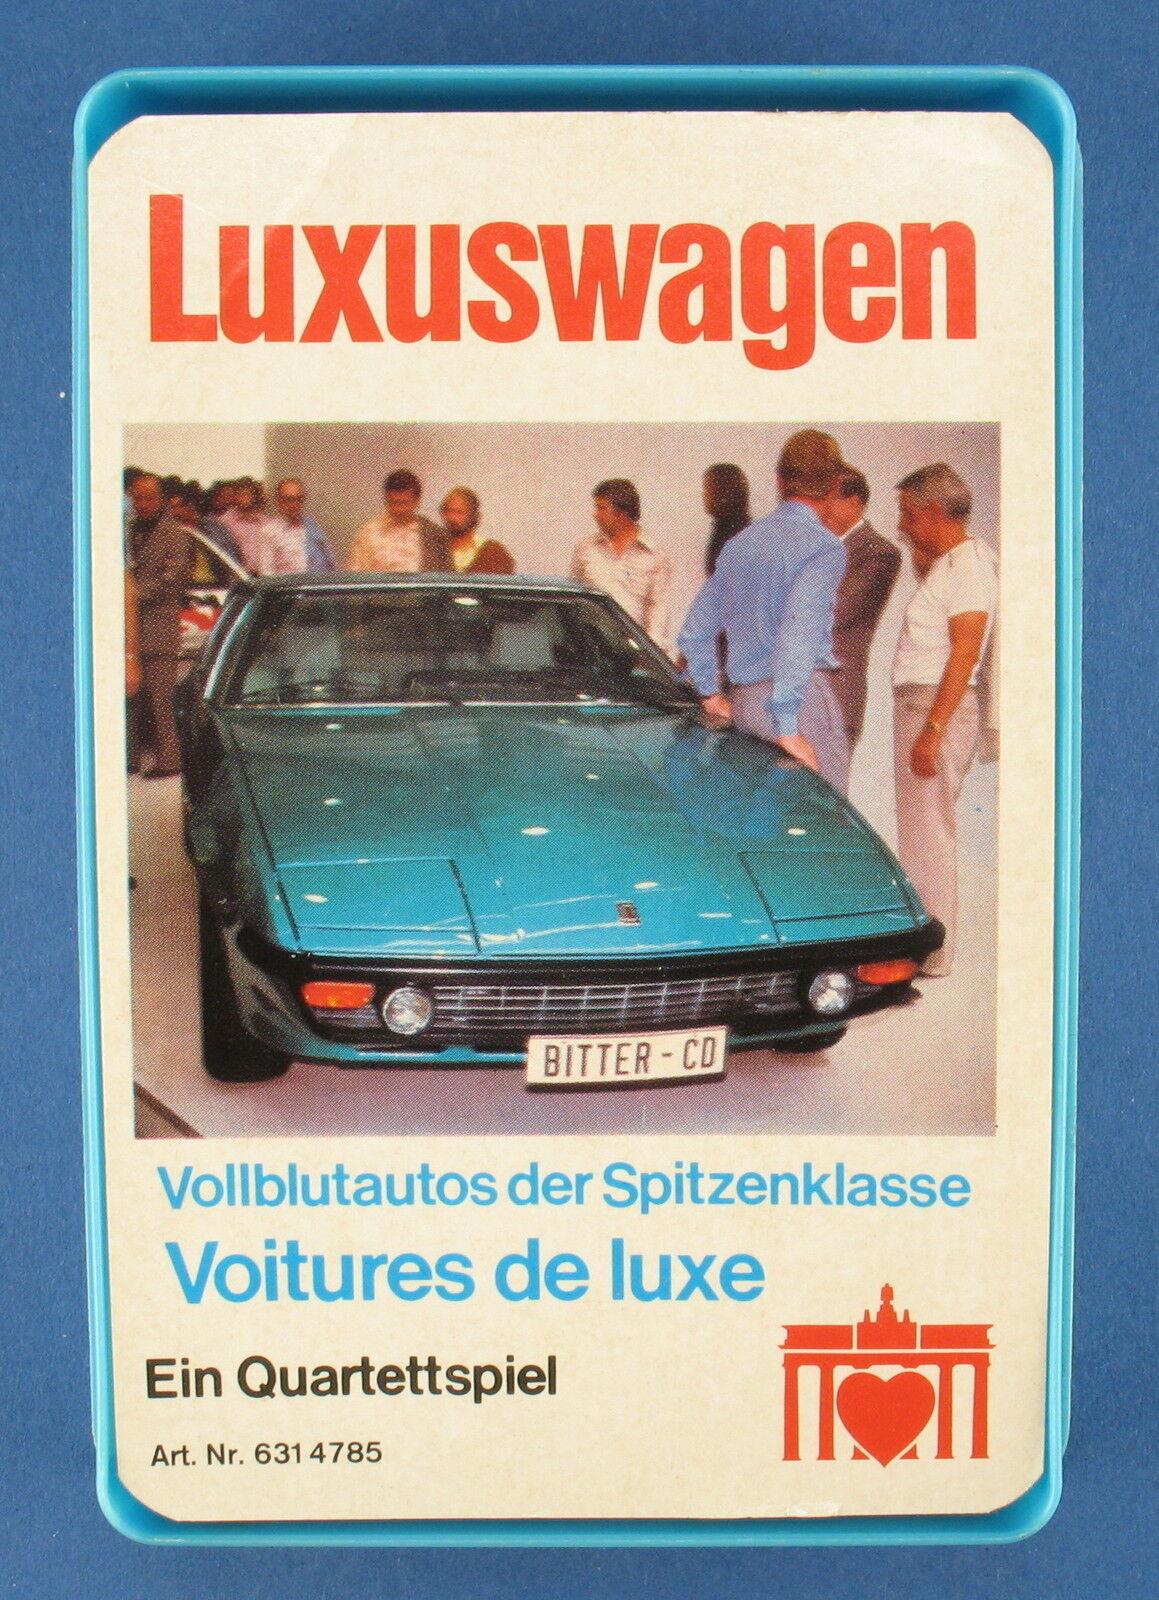 Cuarteto-coche de lujo-Berliner nº 631 4785 - 1976-auto-spanska portón